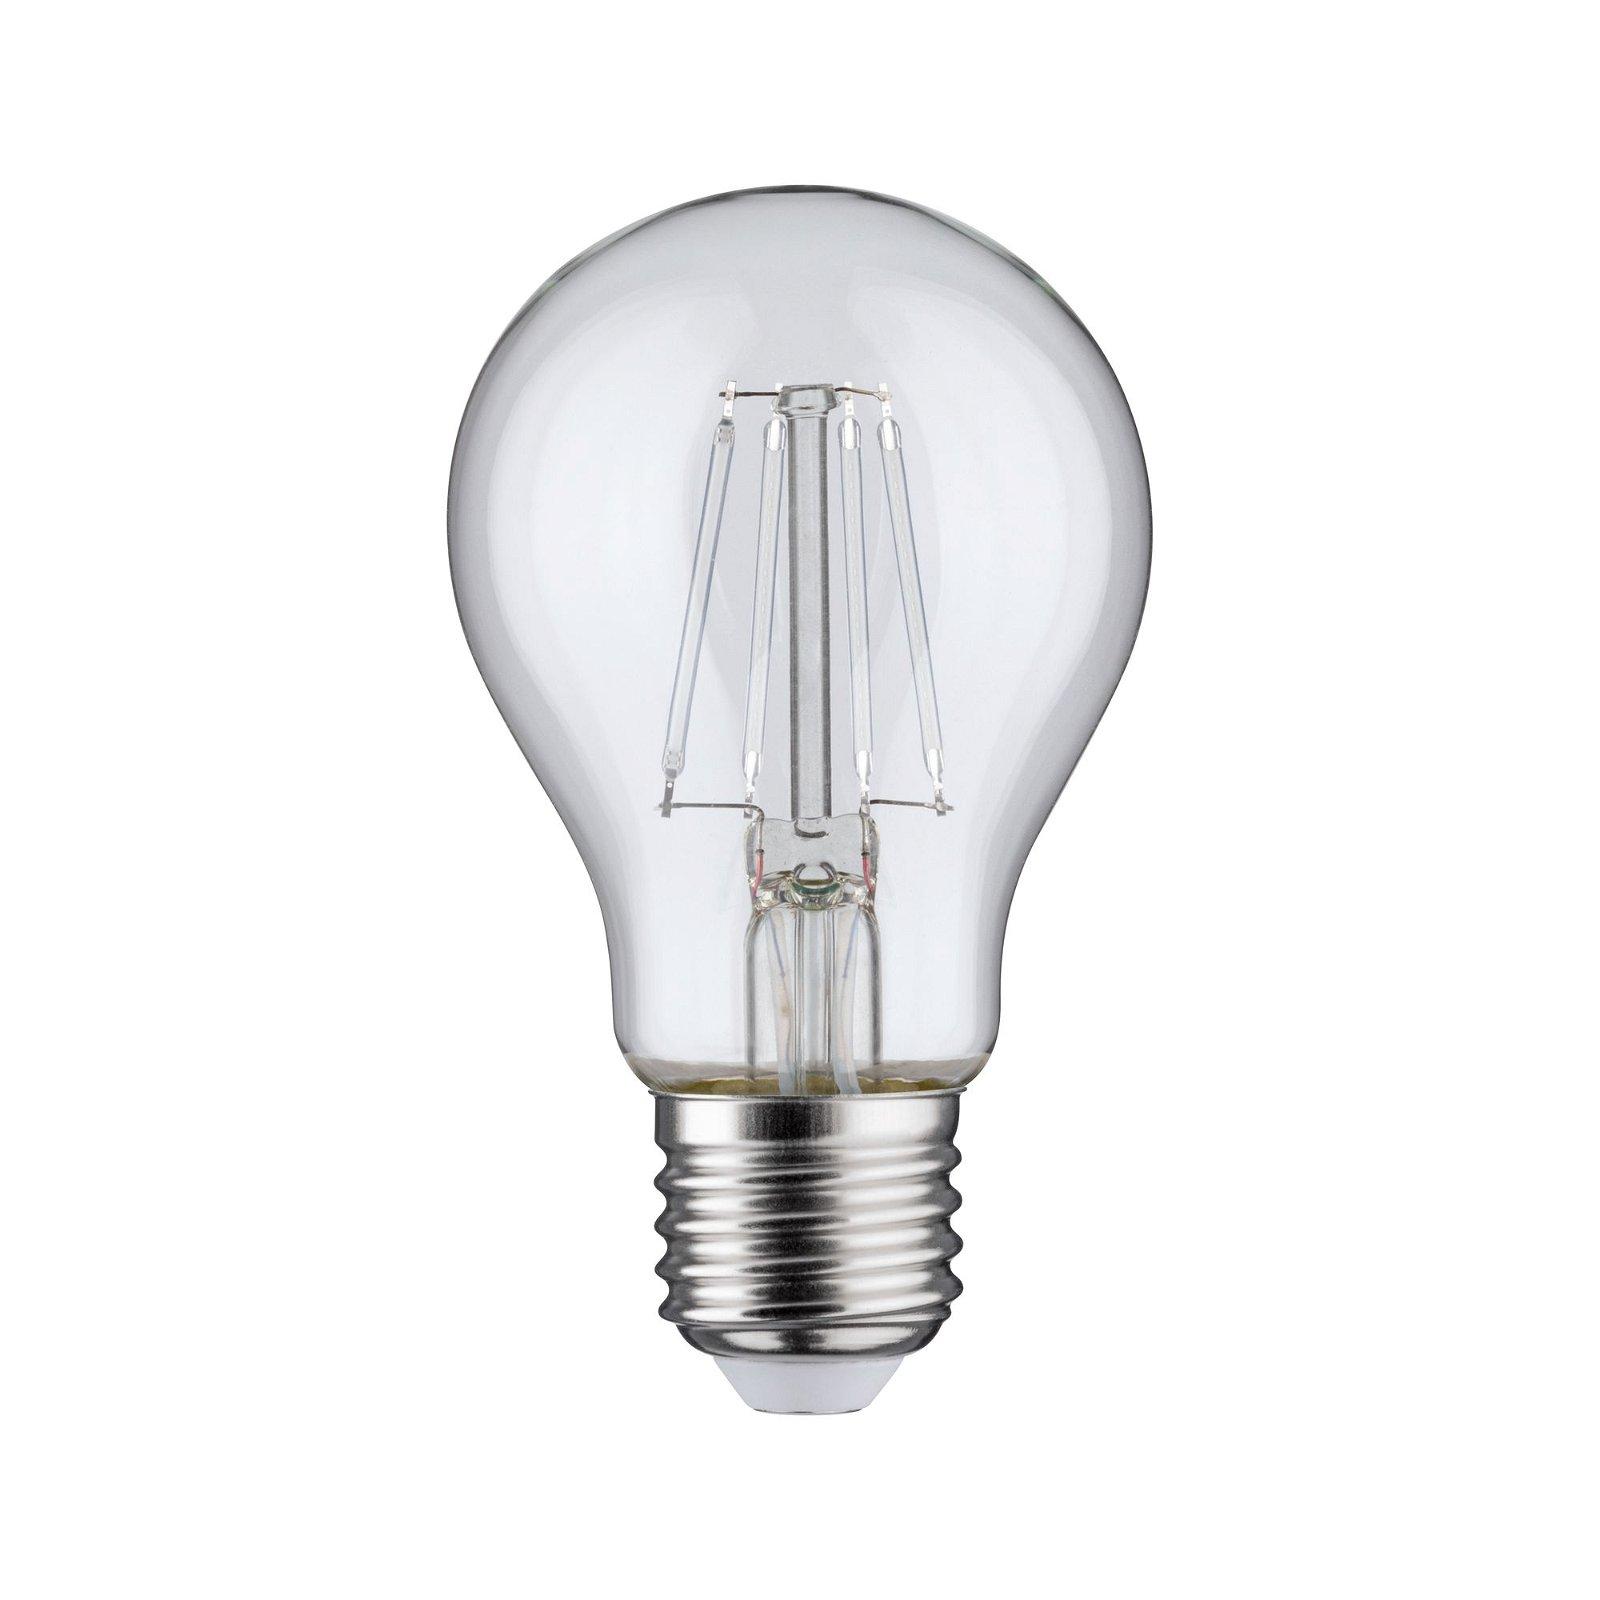 LED Birne Filament E27 230V 40lm 2,2W 1000K Klar